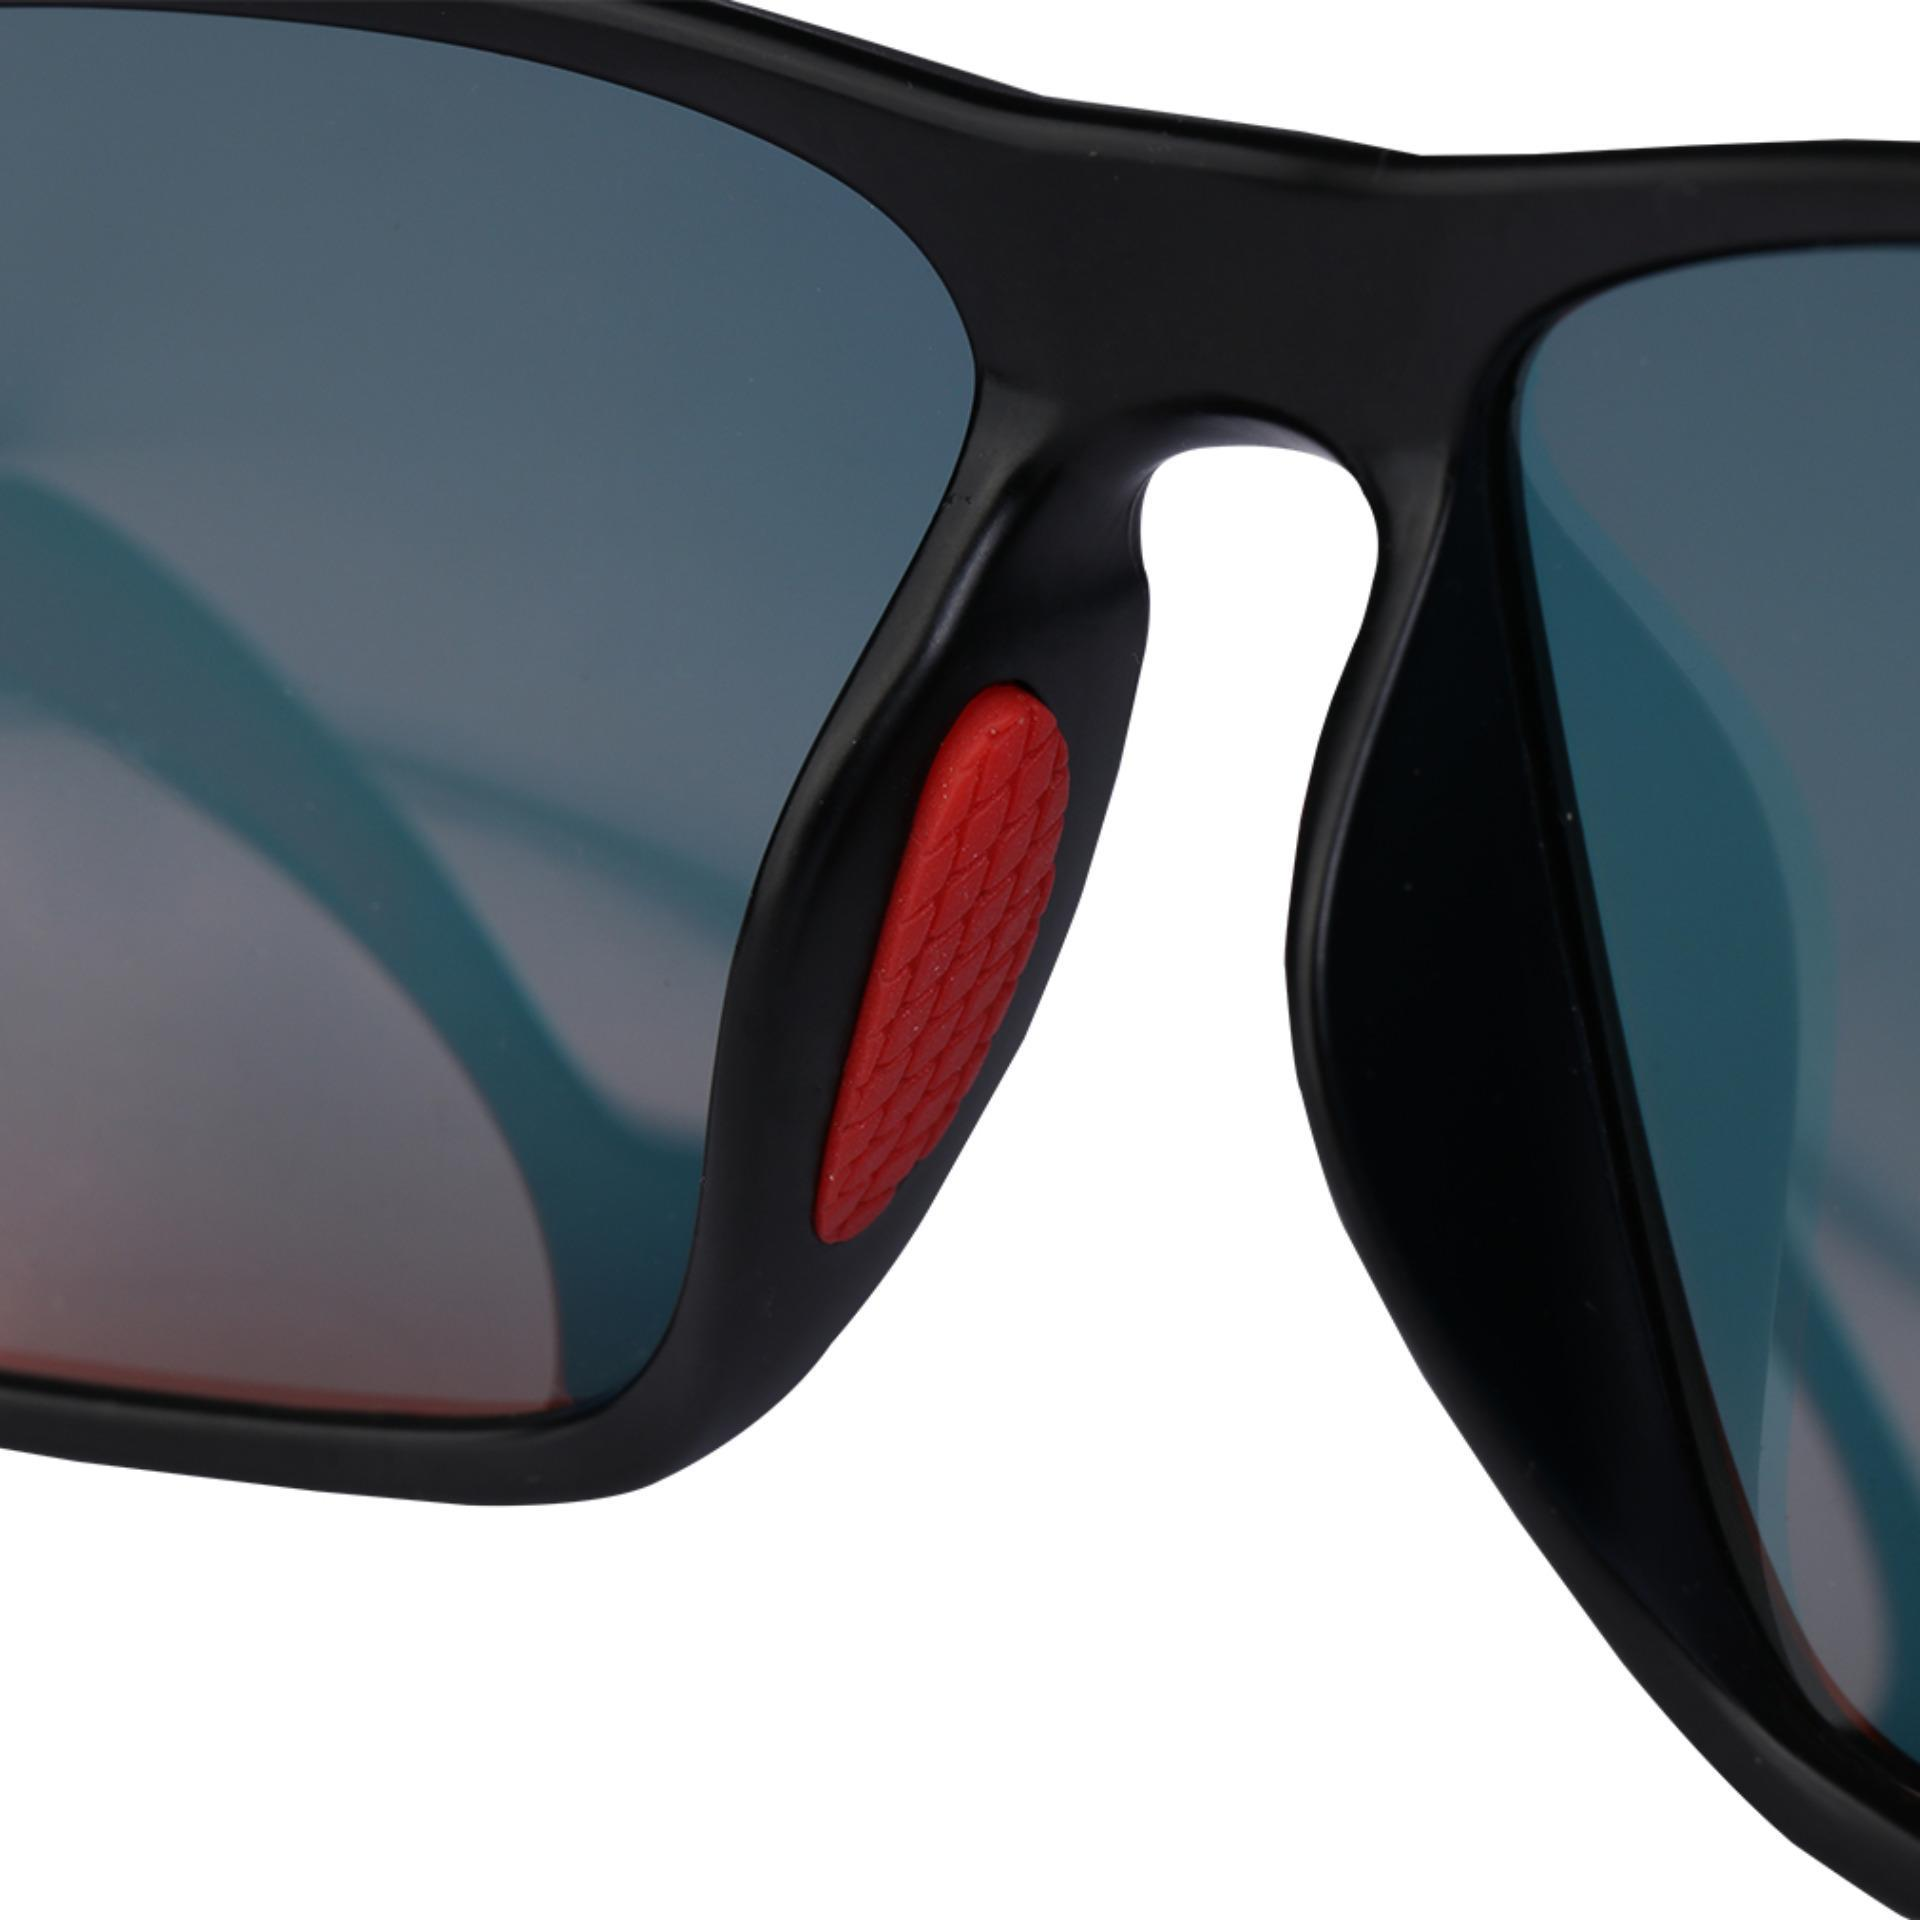 Bandingkan Toko Rockbros Polarized Bicycle Cycling Sunglasses Photochromic Kacamata Sepeda Black Goggles Eyewearglasses Four Style10075 Wine Red